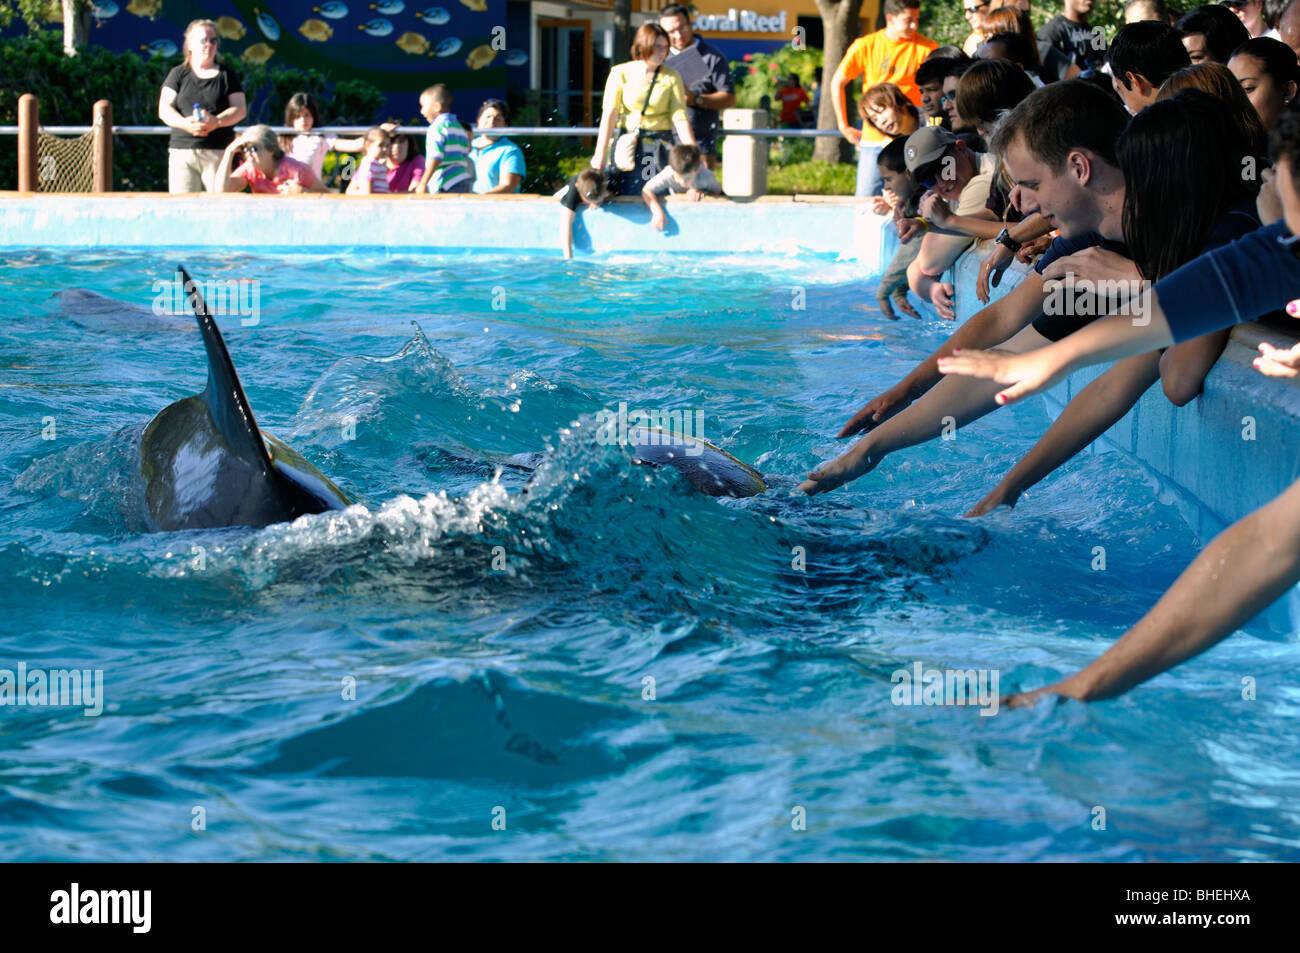 Visitors Feeding Dolphins At Seaworld San Antonio Texas Usa Stock Photo Royalty Free Image